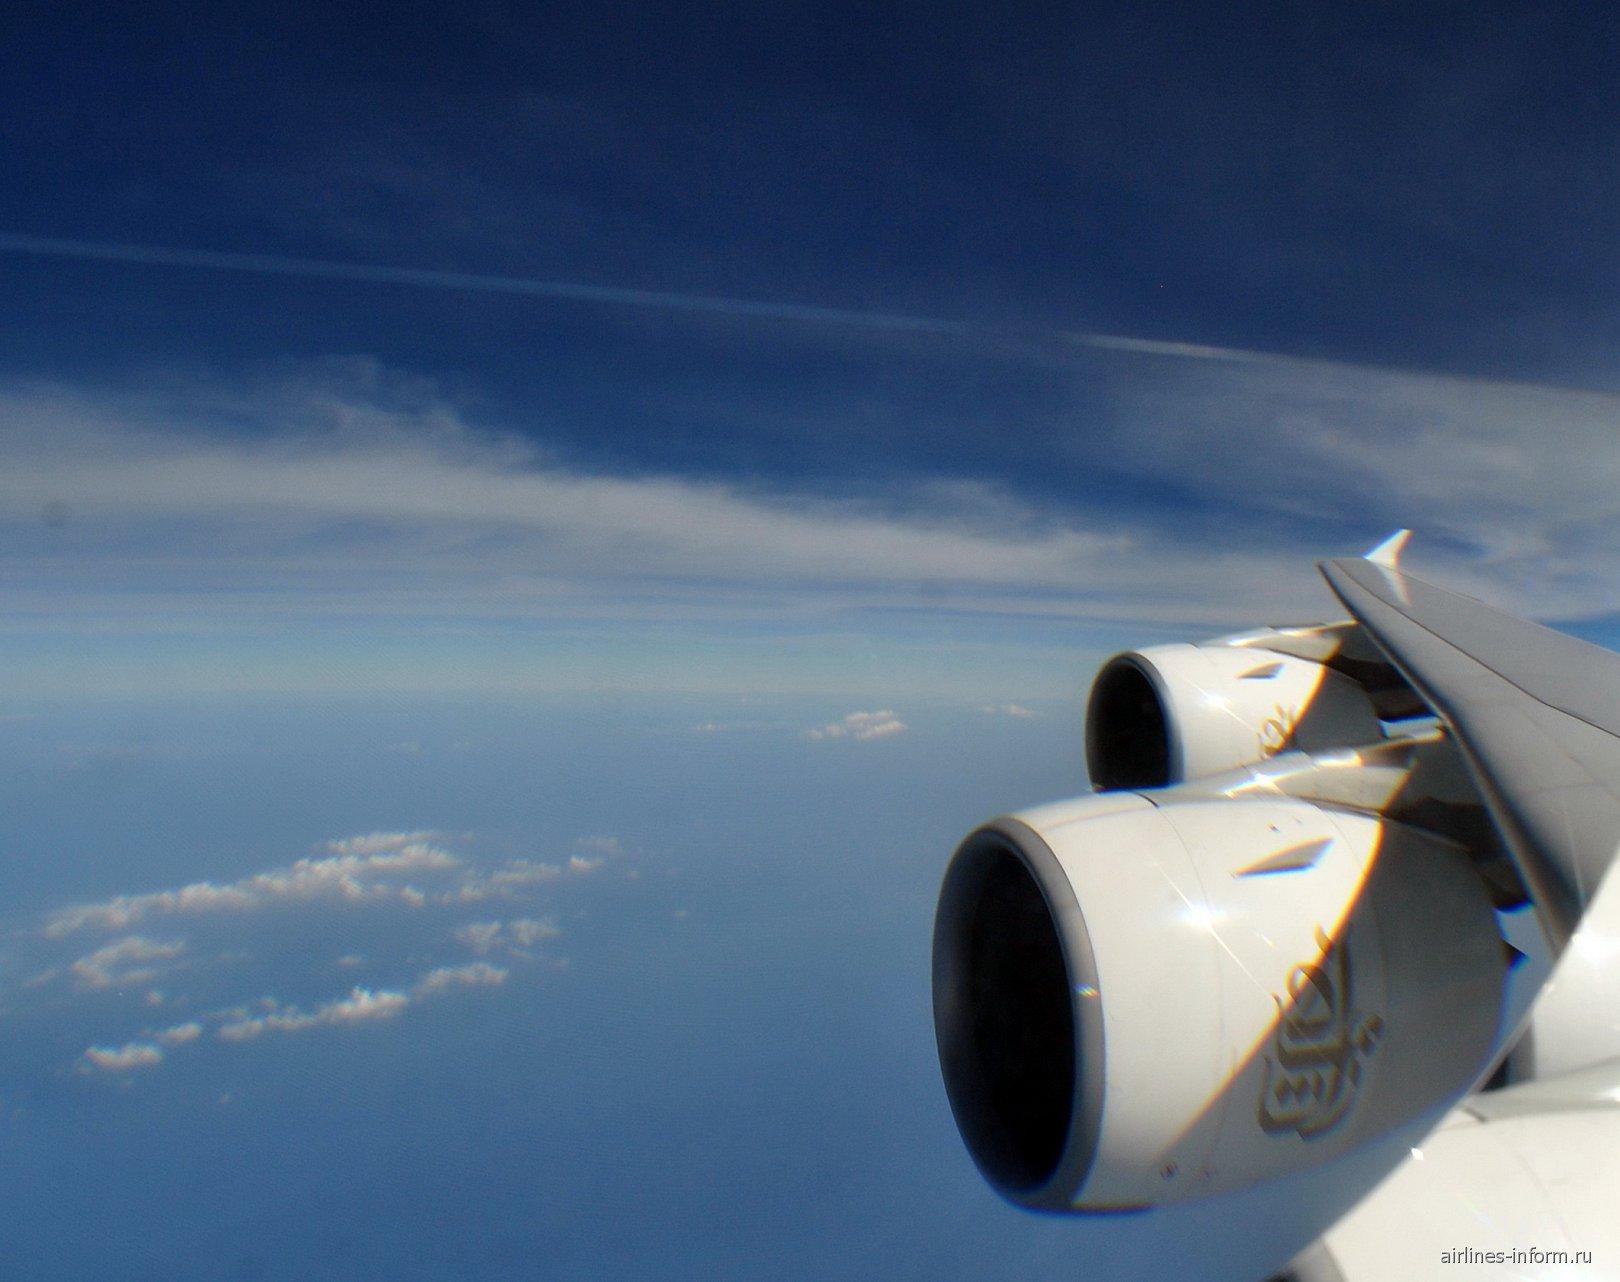 С Emirates в Страну Улыбок. Часть 3. BKK-DXB на Airbus A380-800 A6-EDX